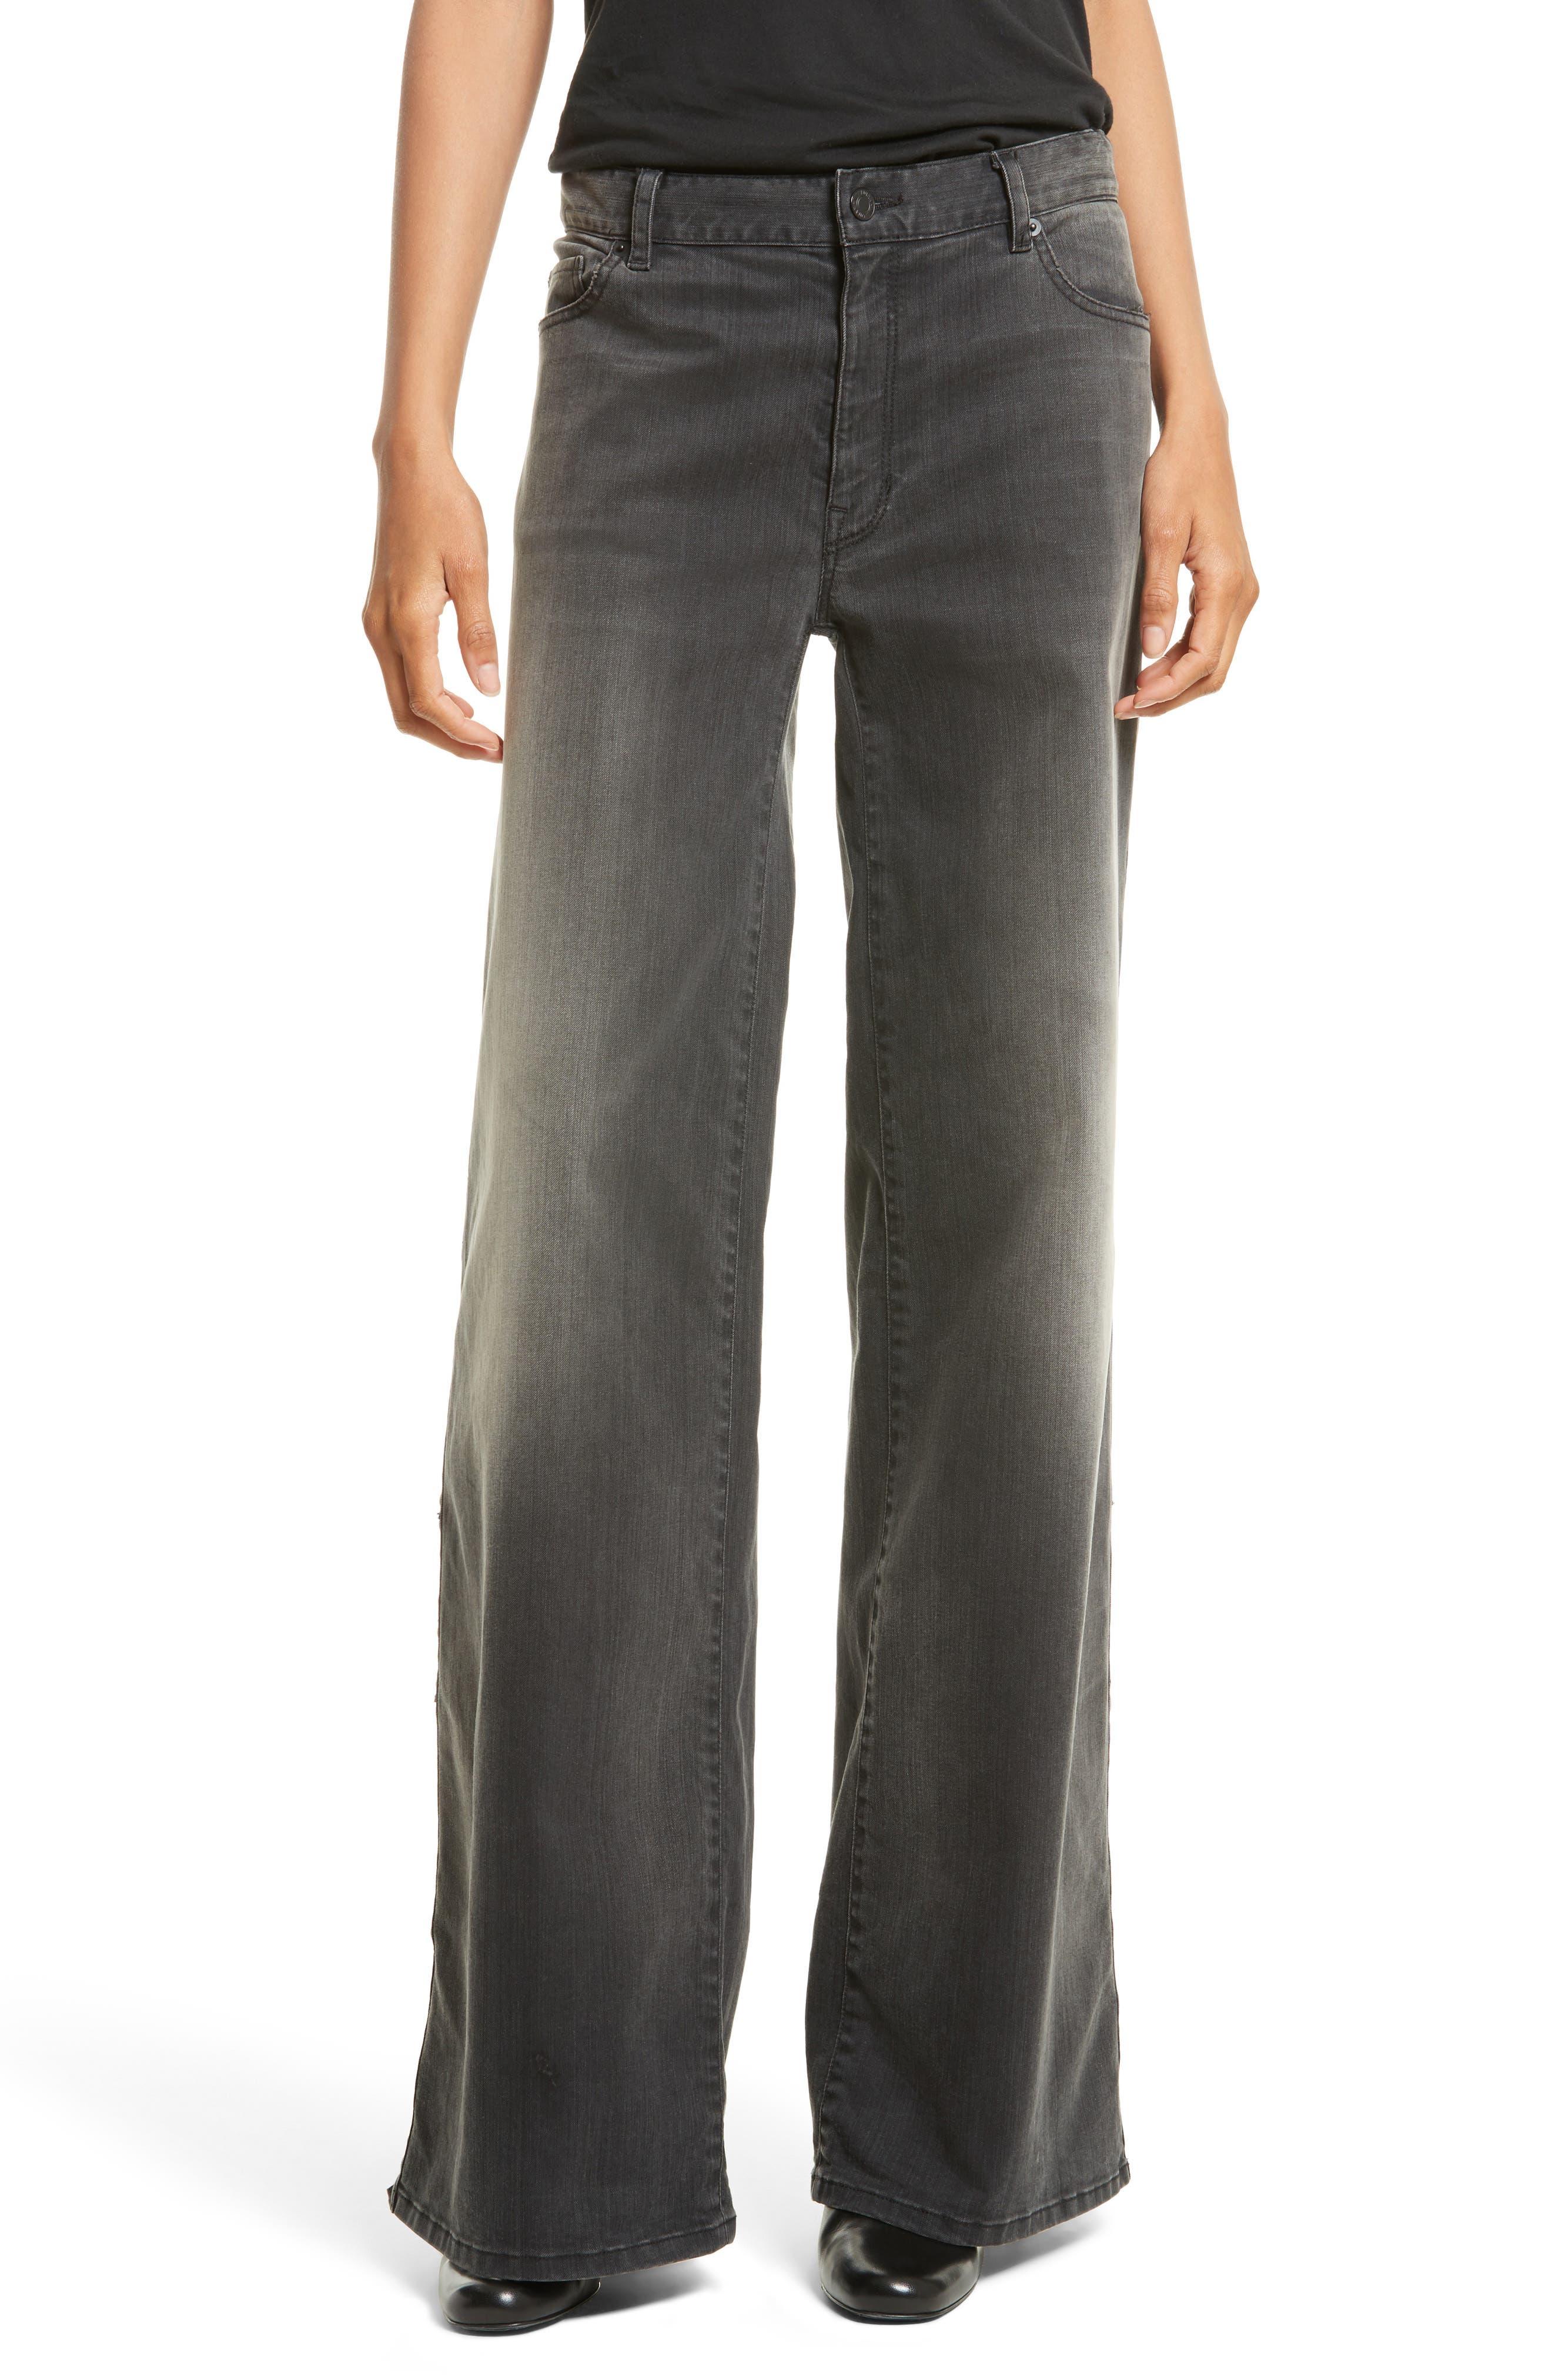 Alternate Image 1 Selected - Nili Lotan Ena Side Button Detail Wide Leg Jeans